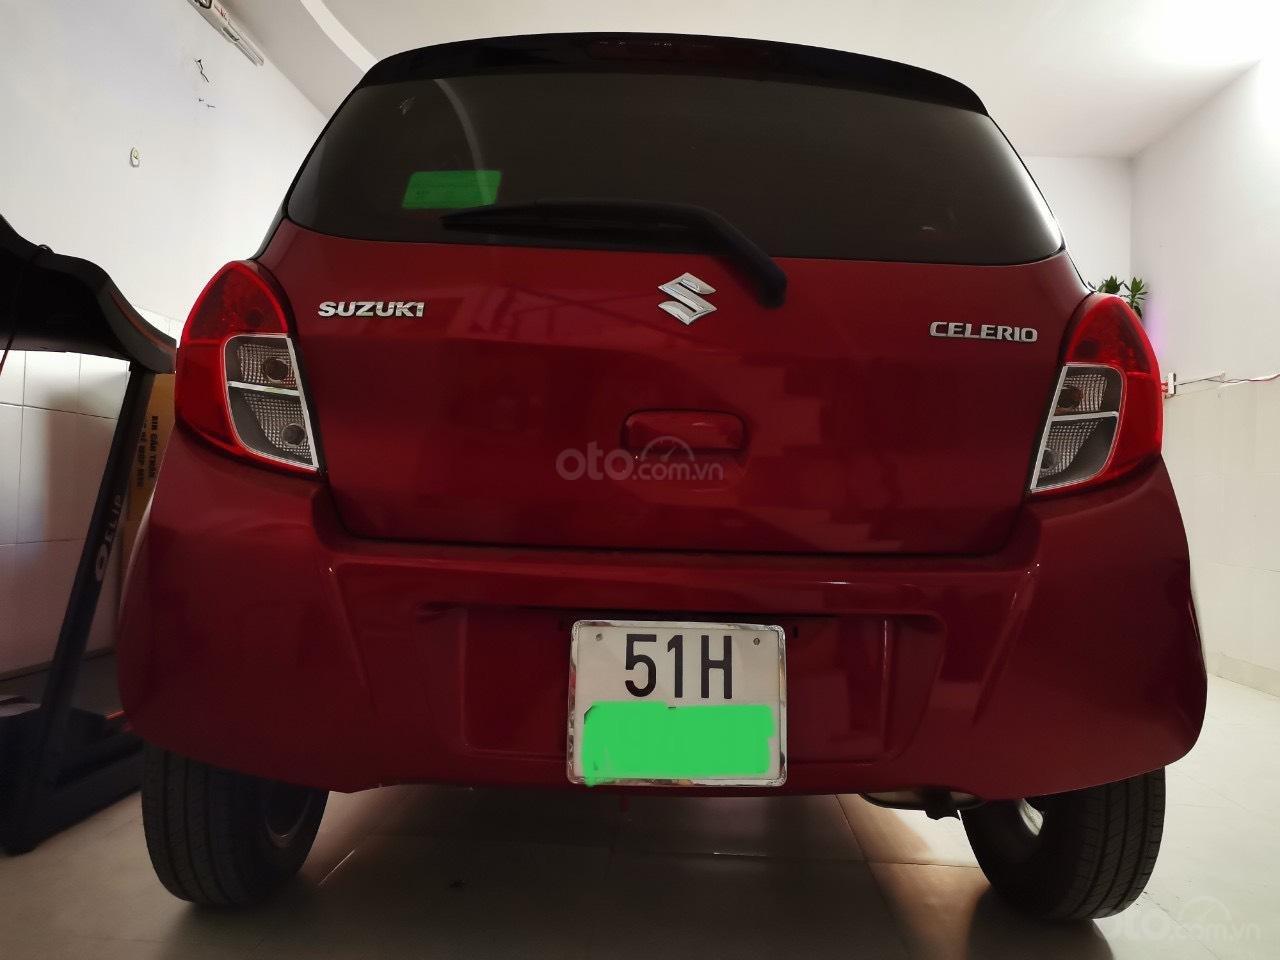 Bán nhanh chiếc Suzuki Celerio 1.0 CVT, lăn bánh 12.000km (3)